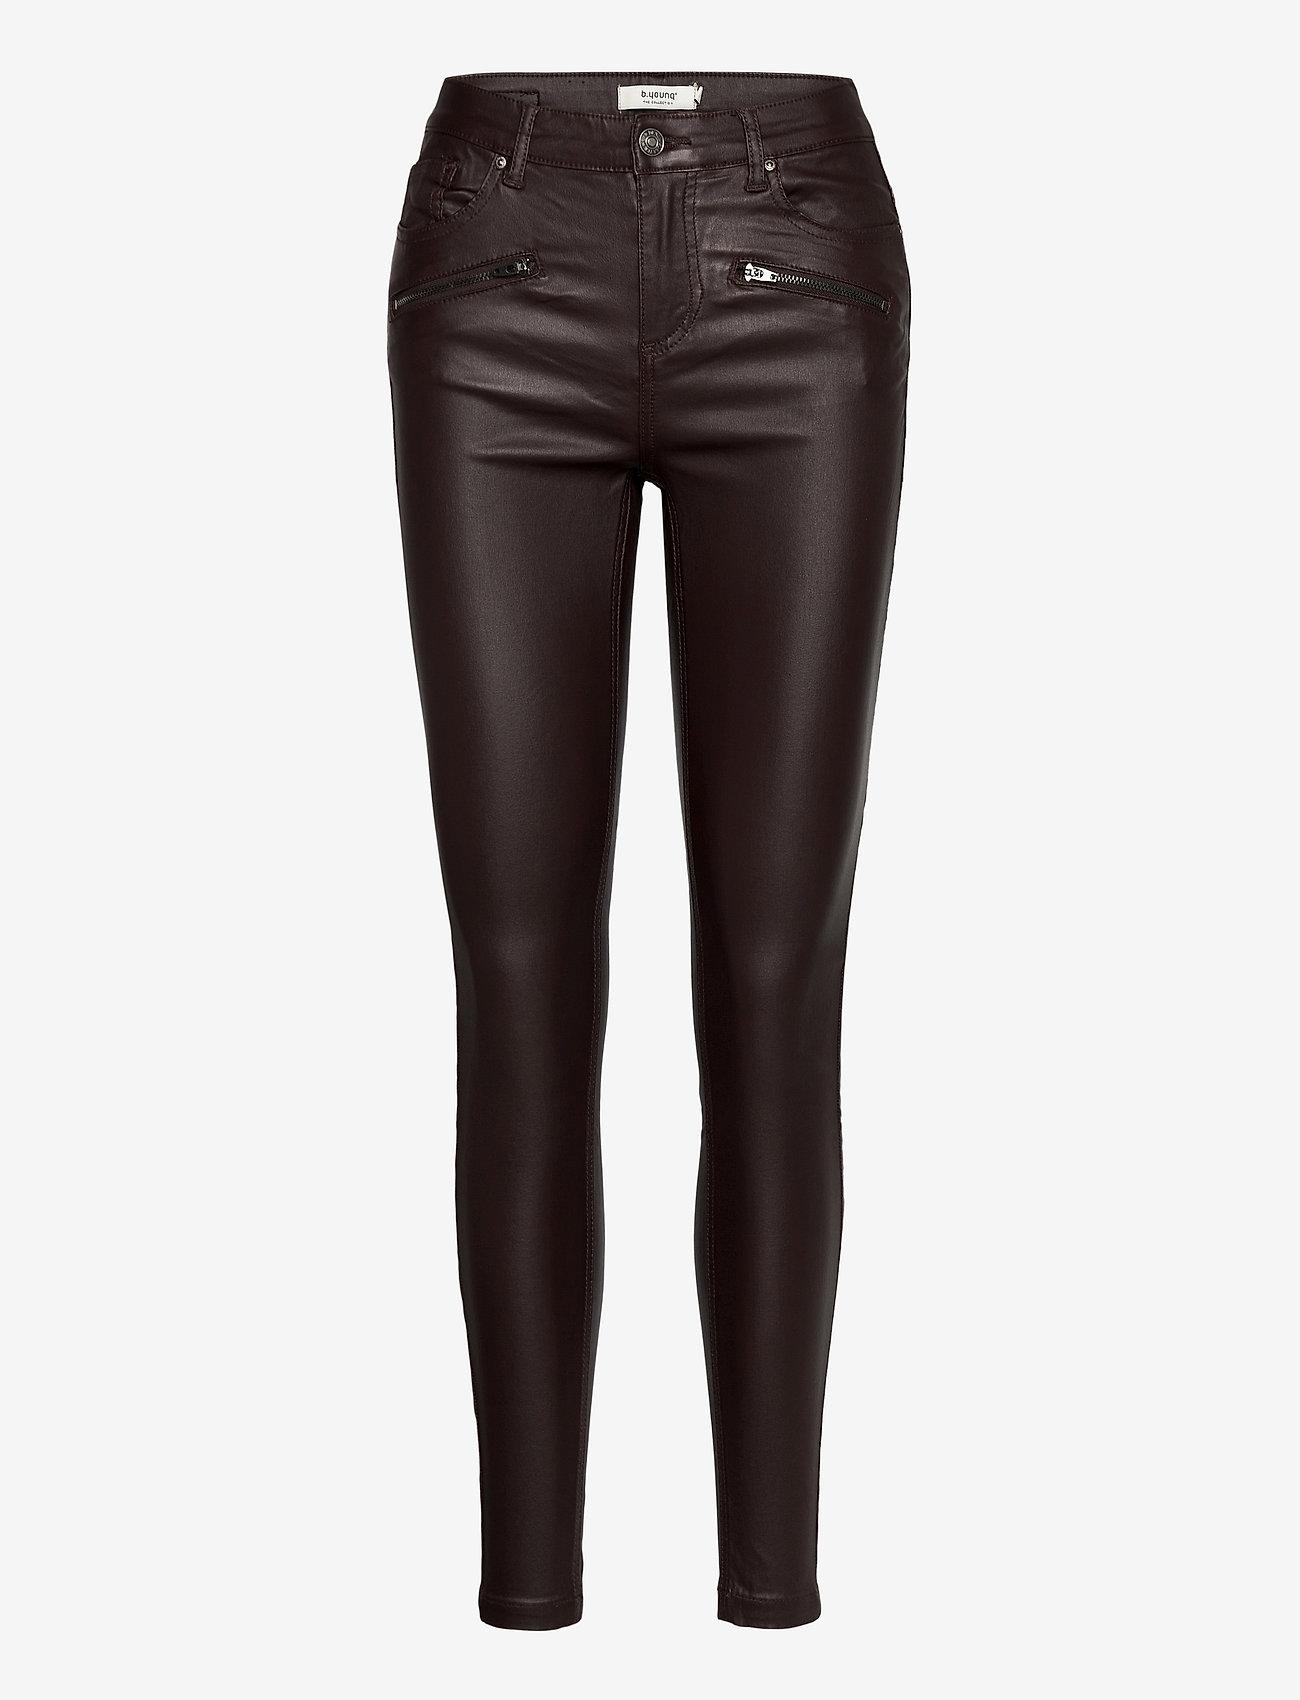 b.young - BYLOLA BYKIKO DECO ZIP - - trousers with skinny legs - chicory coffee - 0